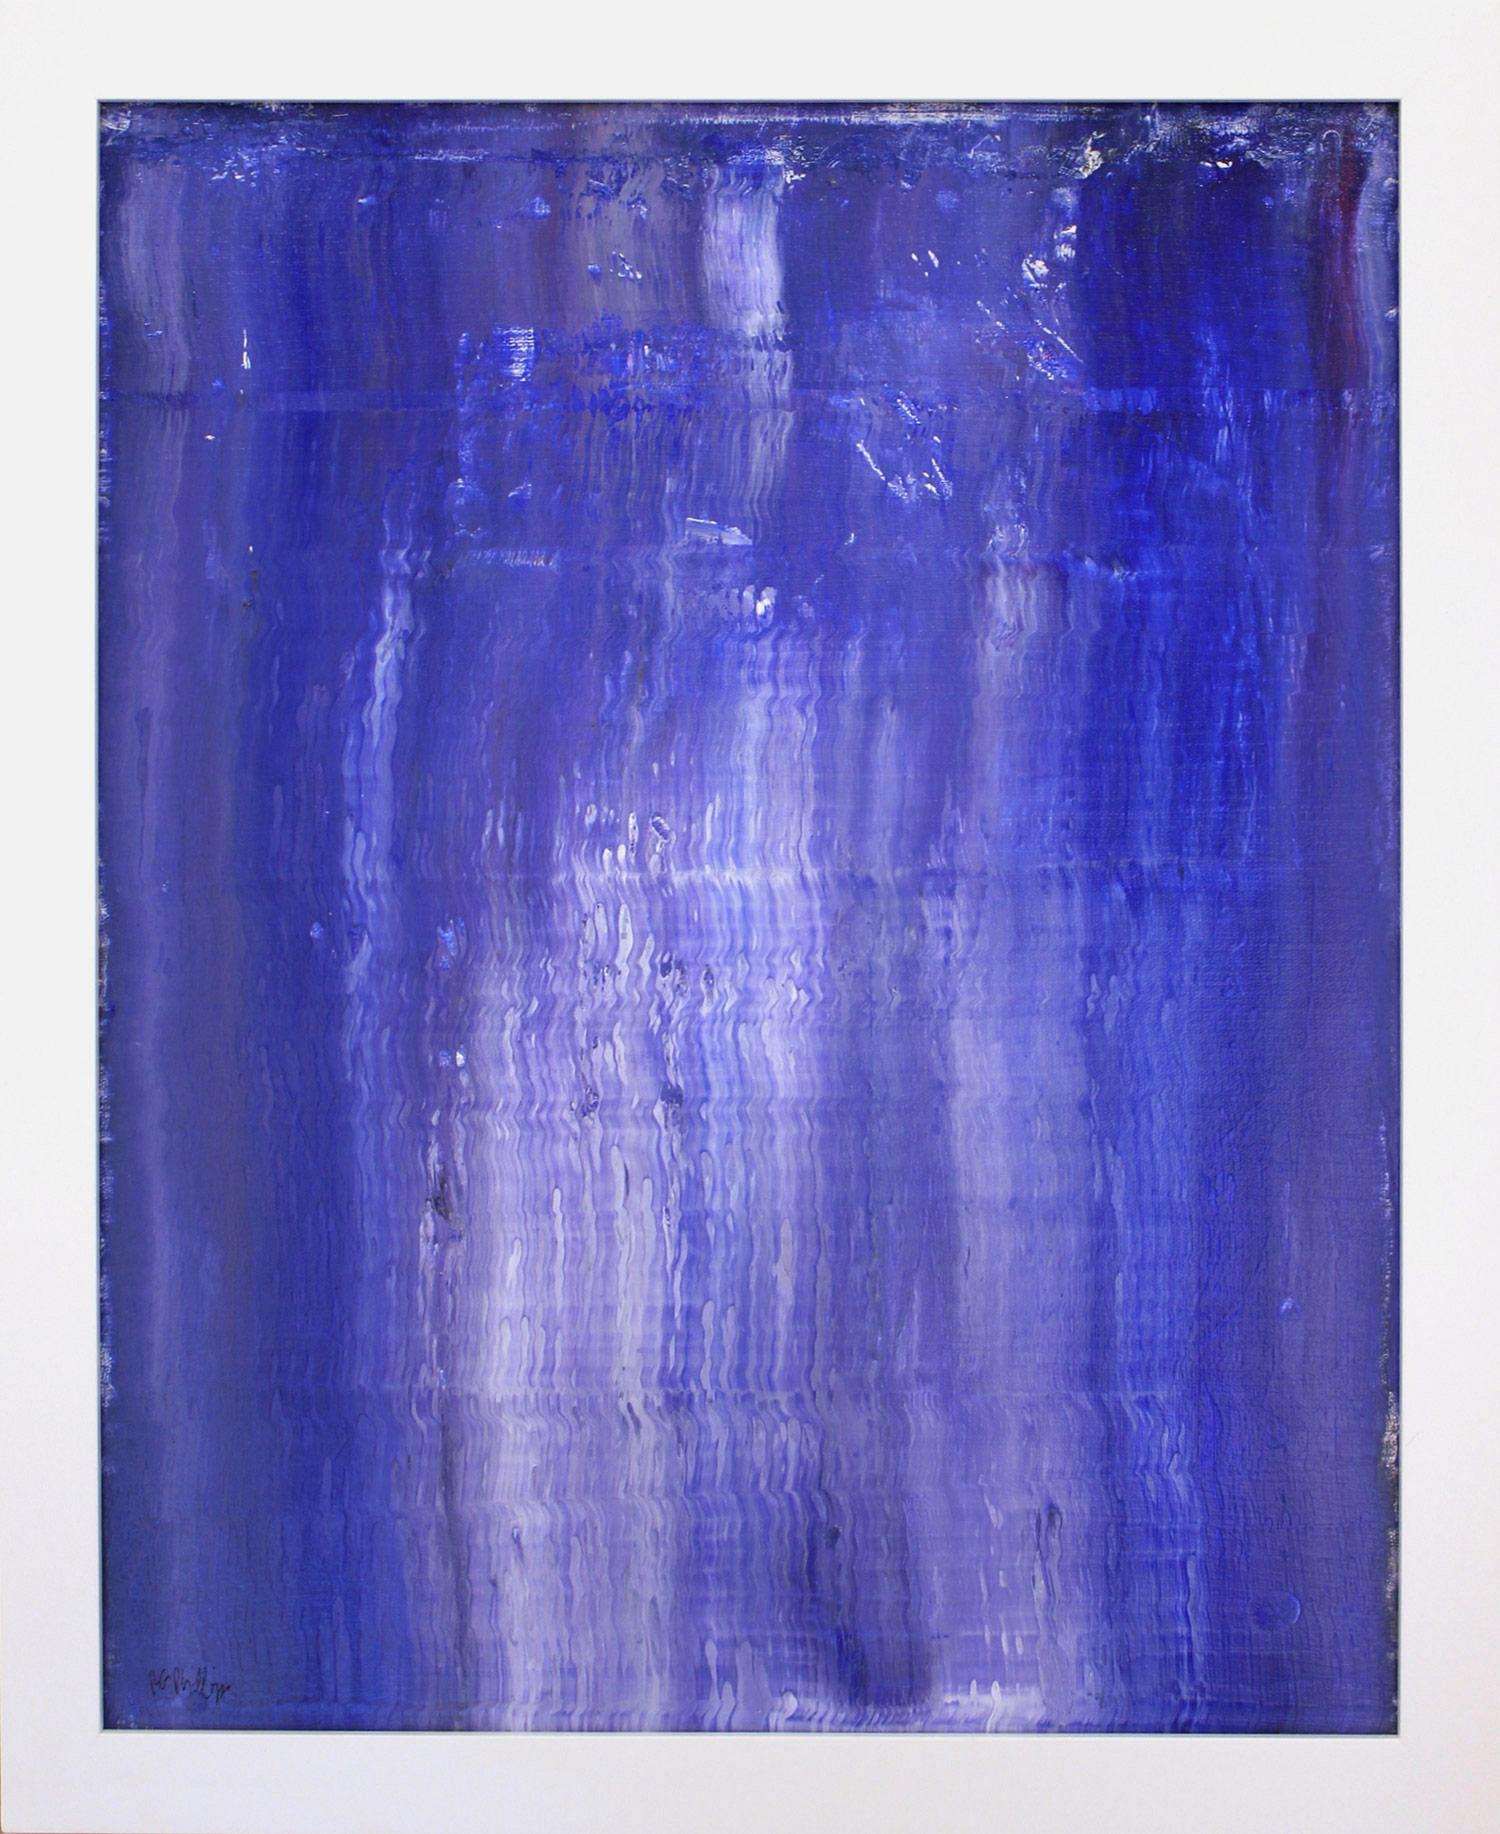 Vertical Relationships of Blue